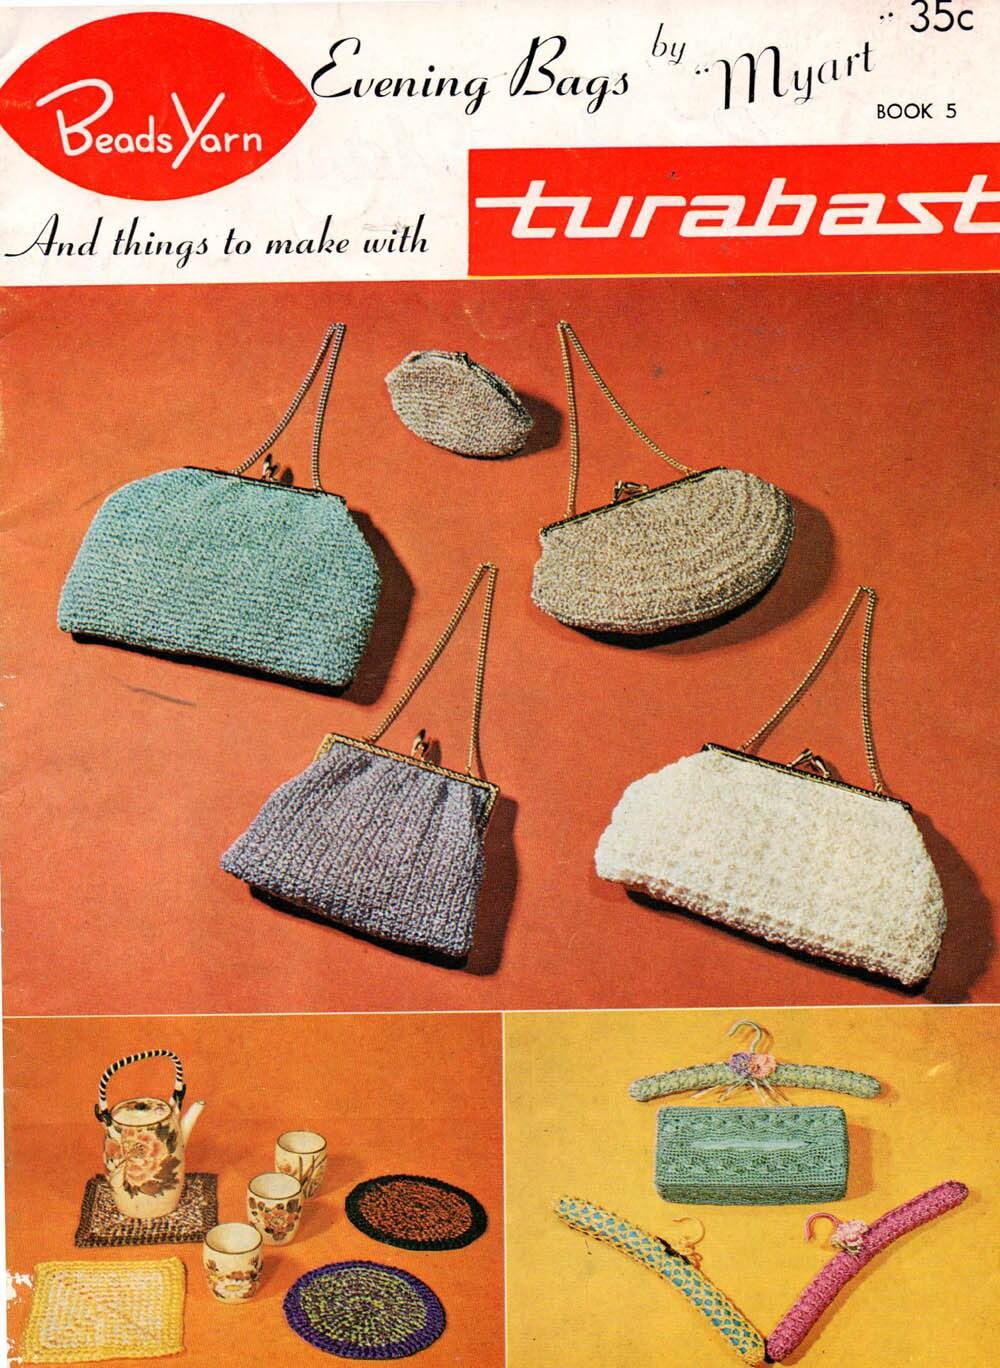 Myart Book 5 Crochet 60s Purses Handbags Coat Hanger Covers Etsy